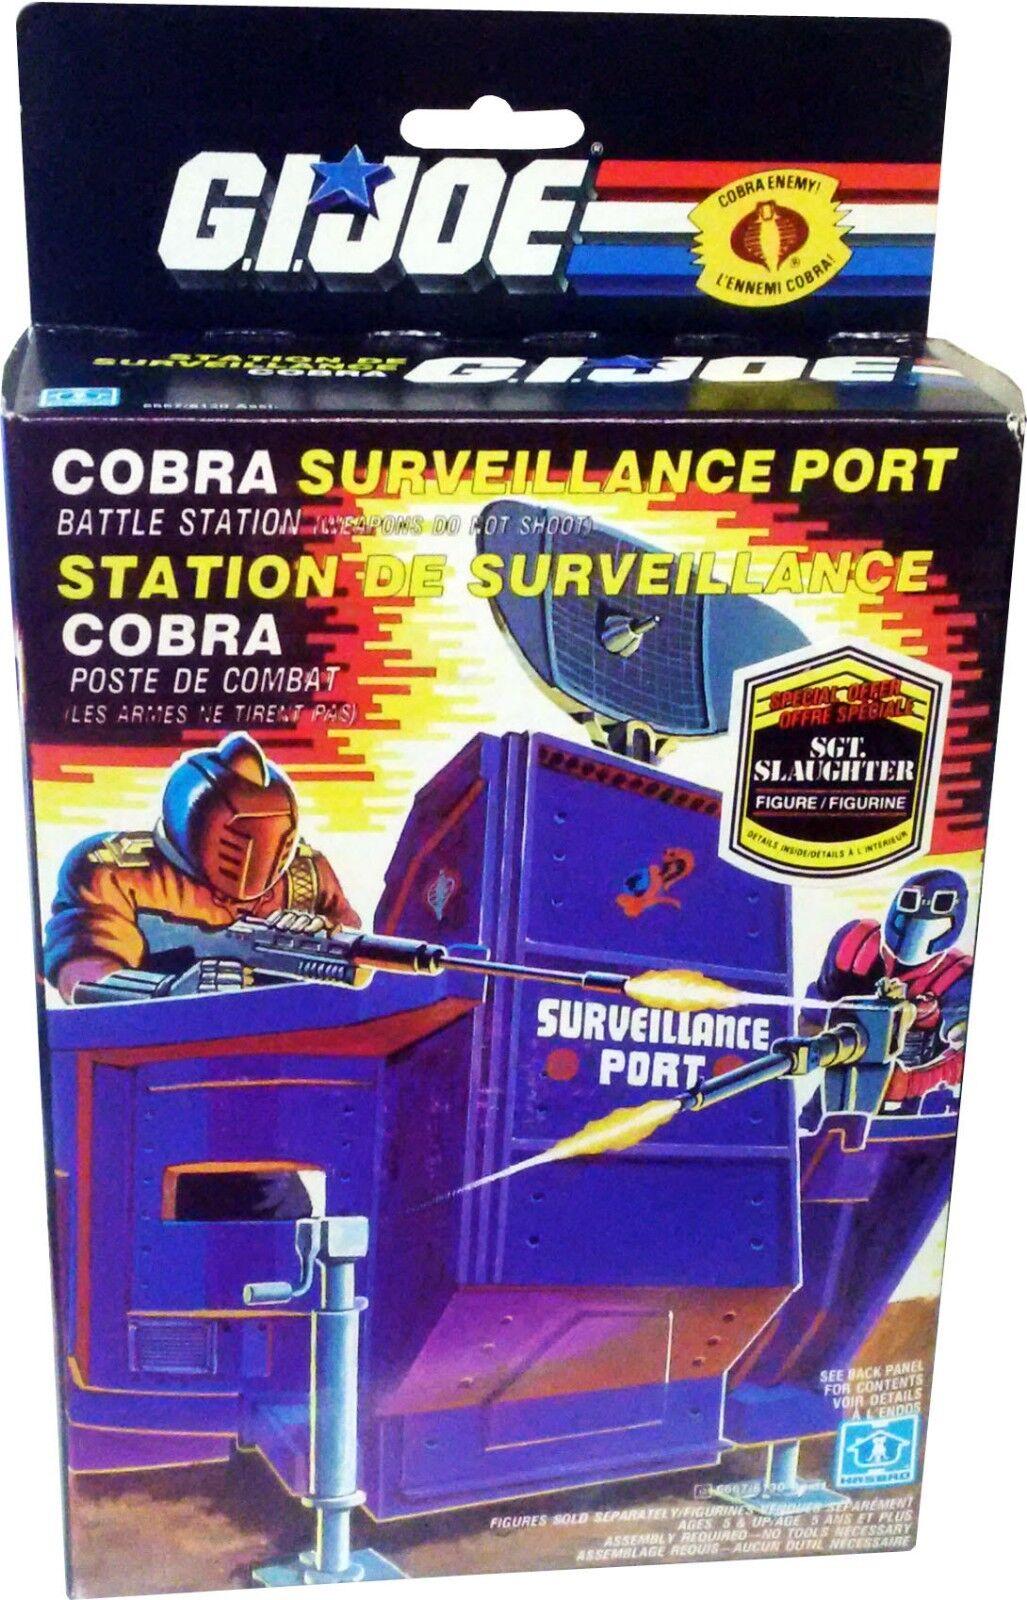 G.I.Joe Cobra Surveillance Port - Vintage 1986 - Collectible   New   - MISB